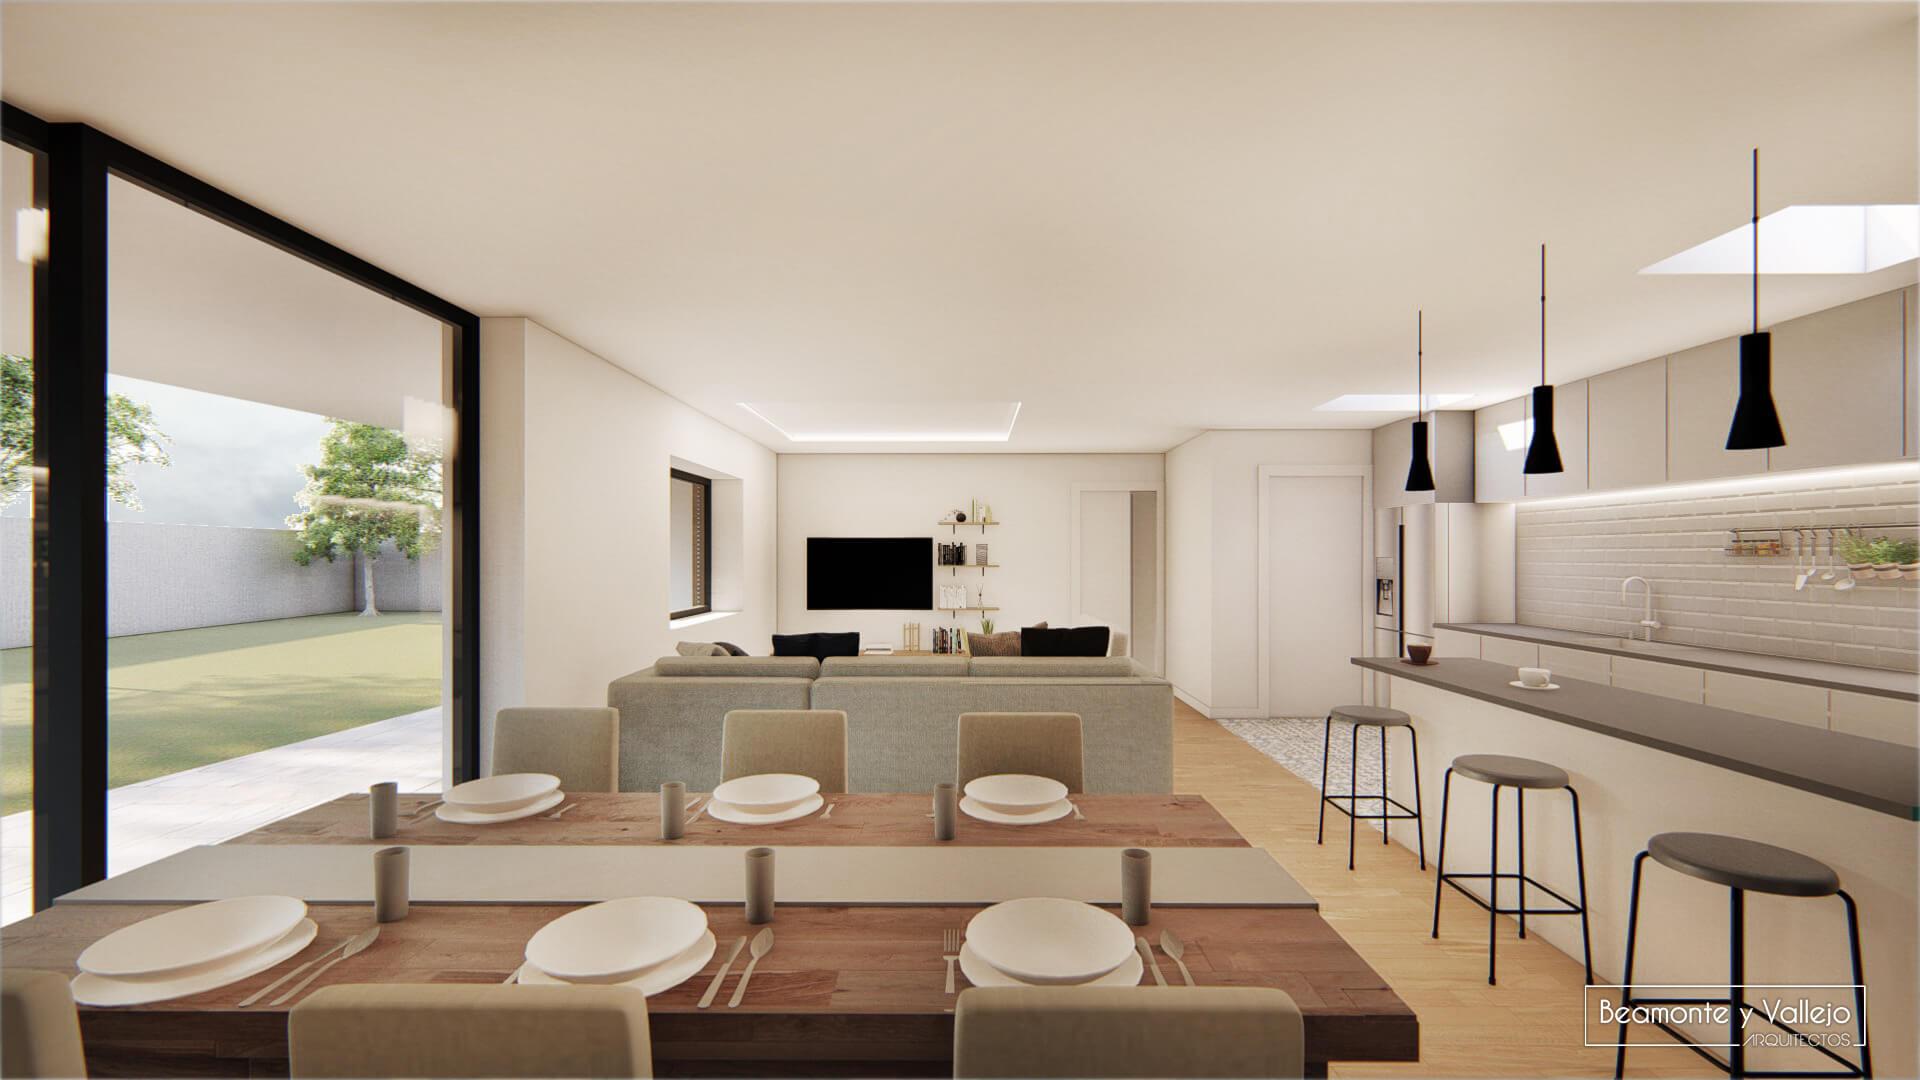 Beamonte y Vallejo Arquitectos - Passivhaus Pradejón 3